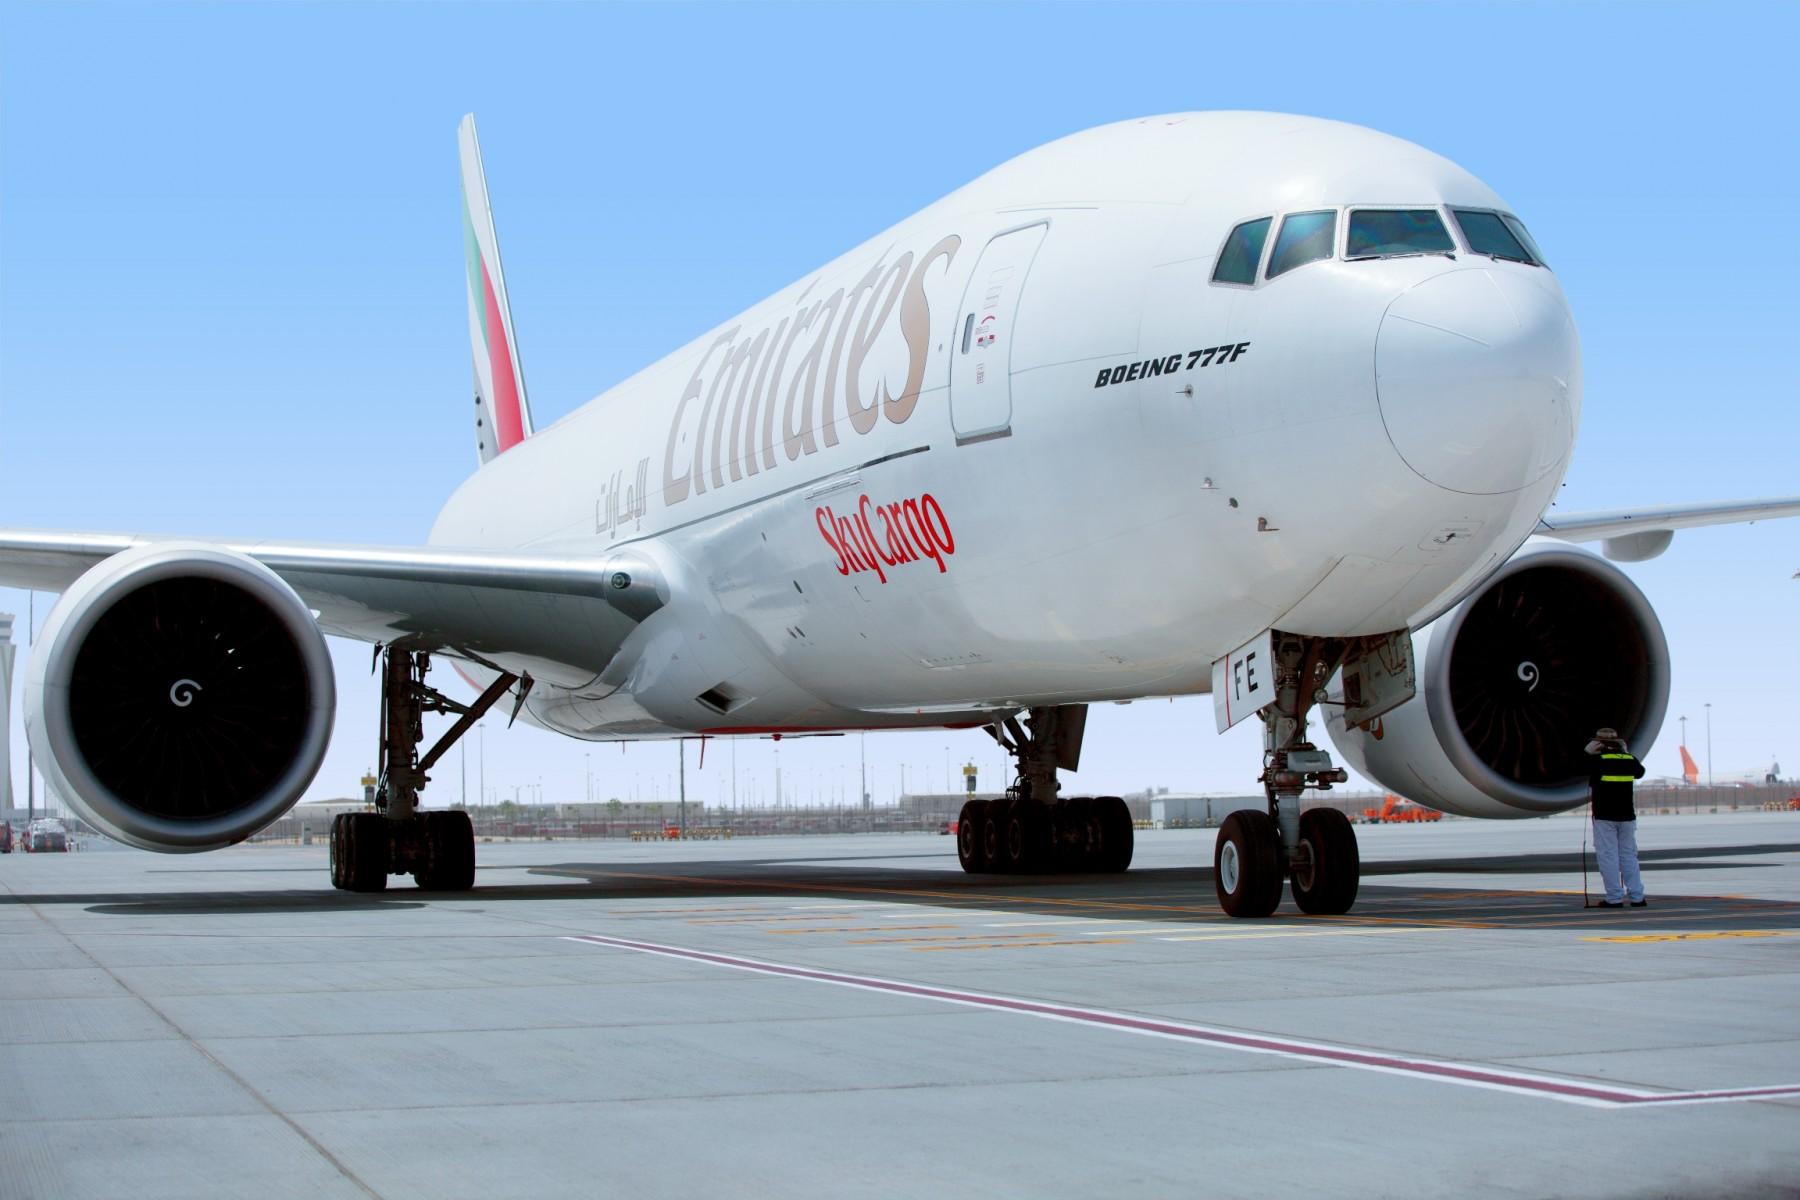 Emirates Skycargo Adds Bonded Truck